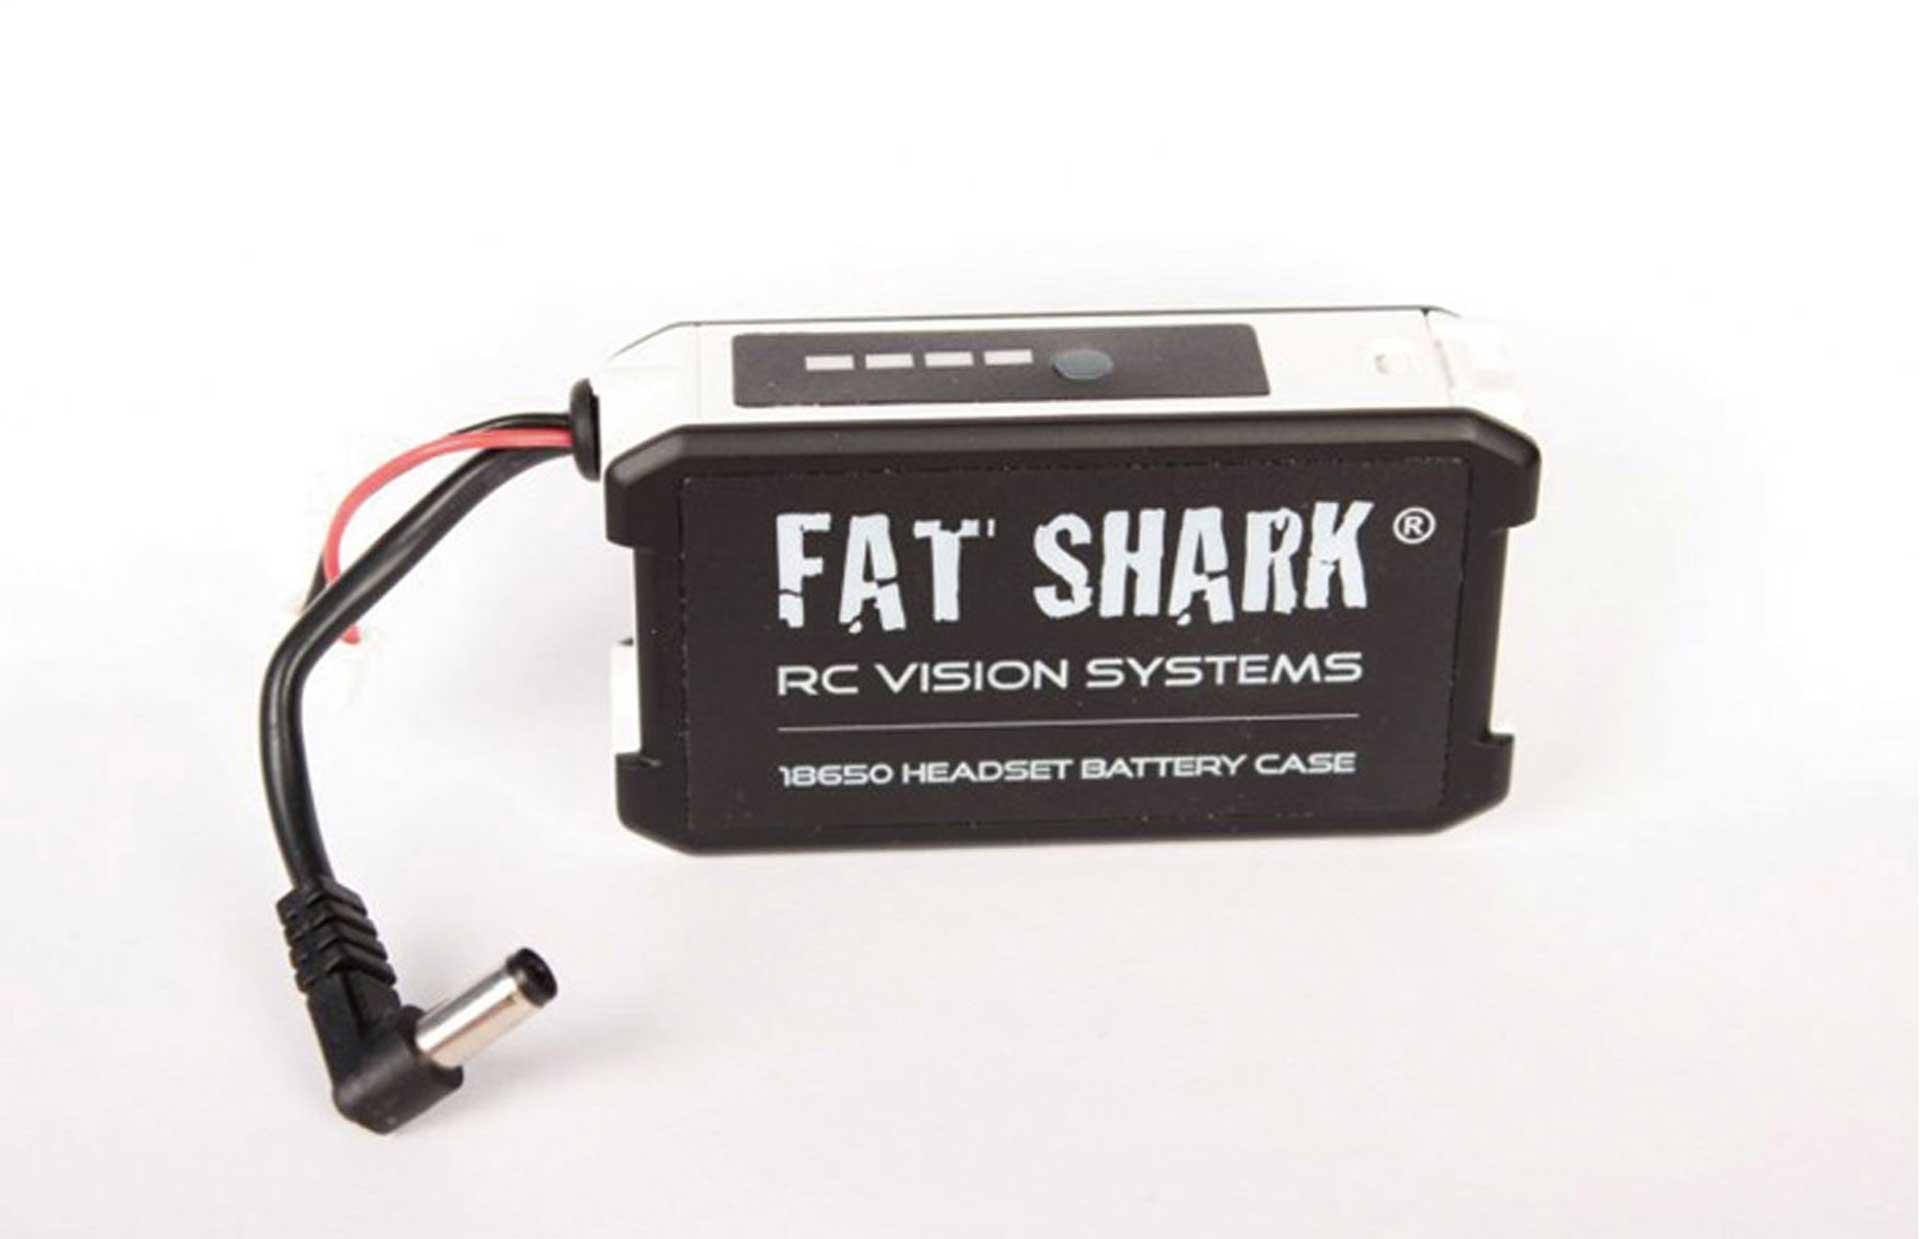 FAT SHARK TRANSFORMER HD BUNDLE DIVERSITY SYSTEM